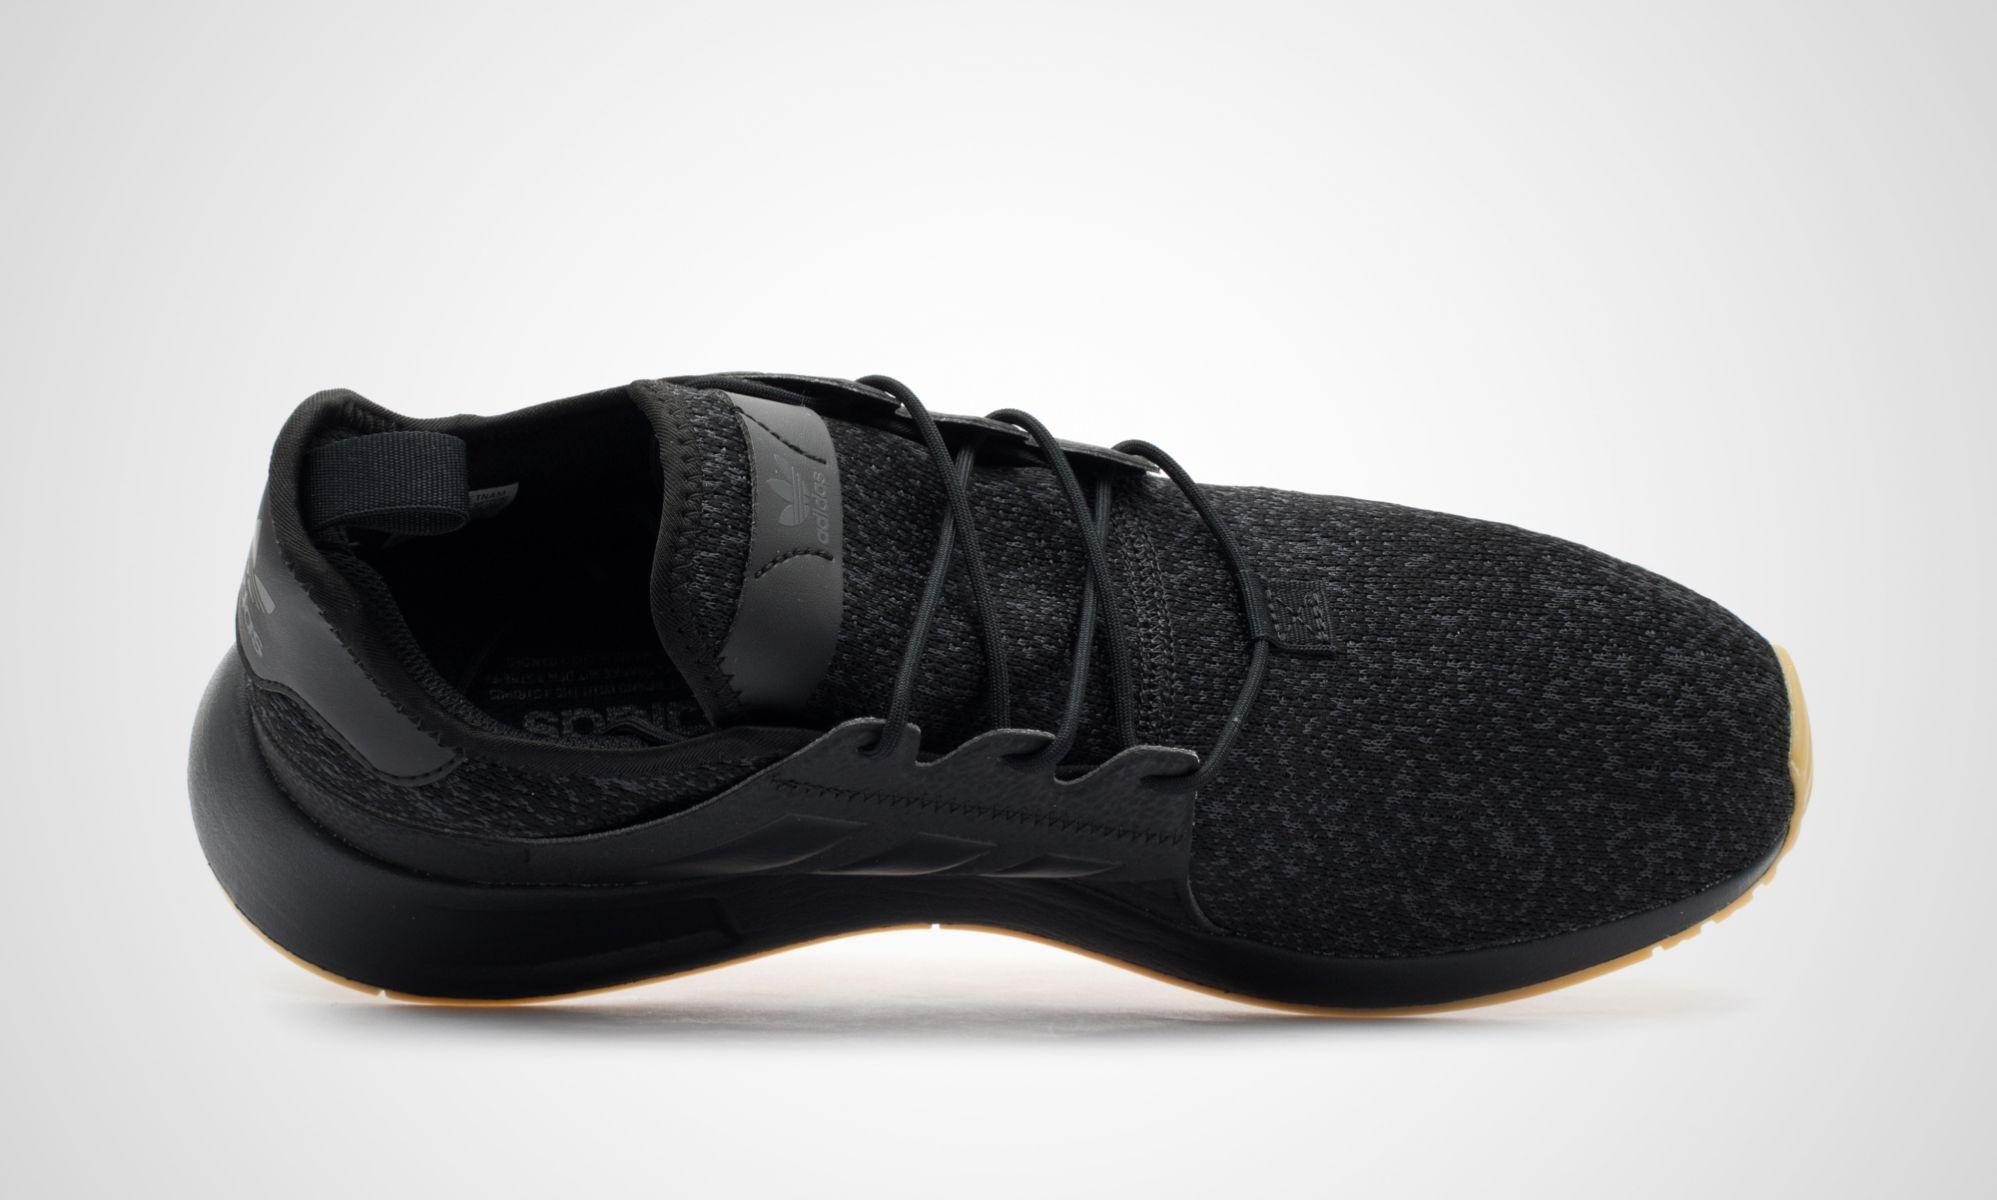 wholesale dealer 66b38 59515 Adidas Originals Trefoil Scarpe Sneakers Trainers Sportive Nero X PLR Uomo  201 7 7 di 12 ...